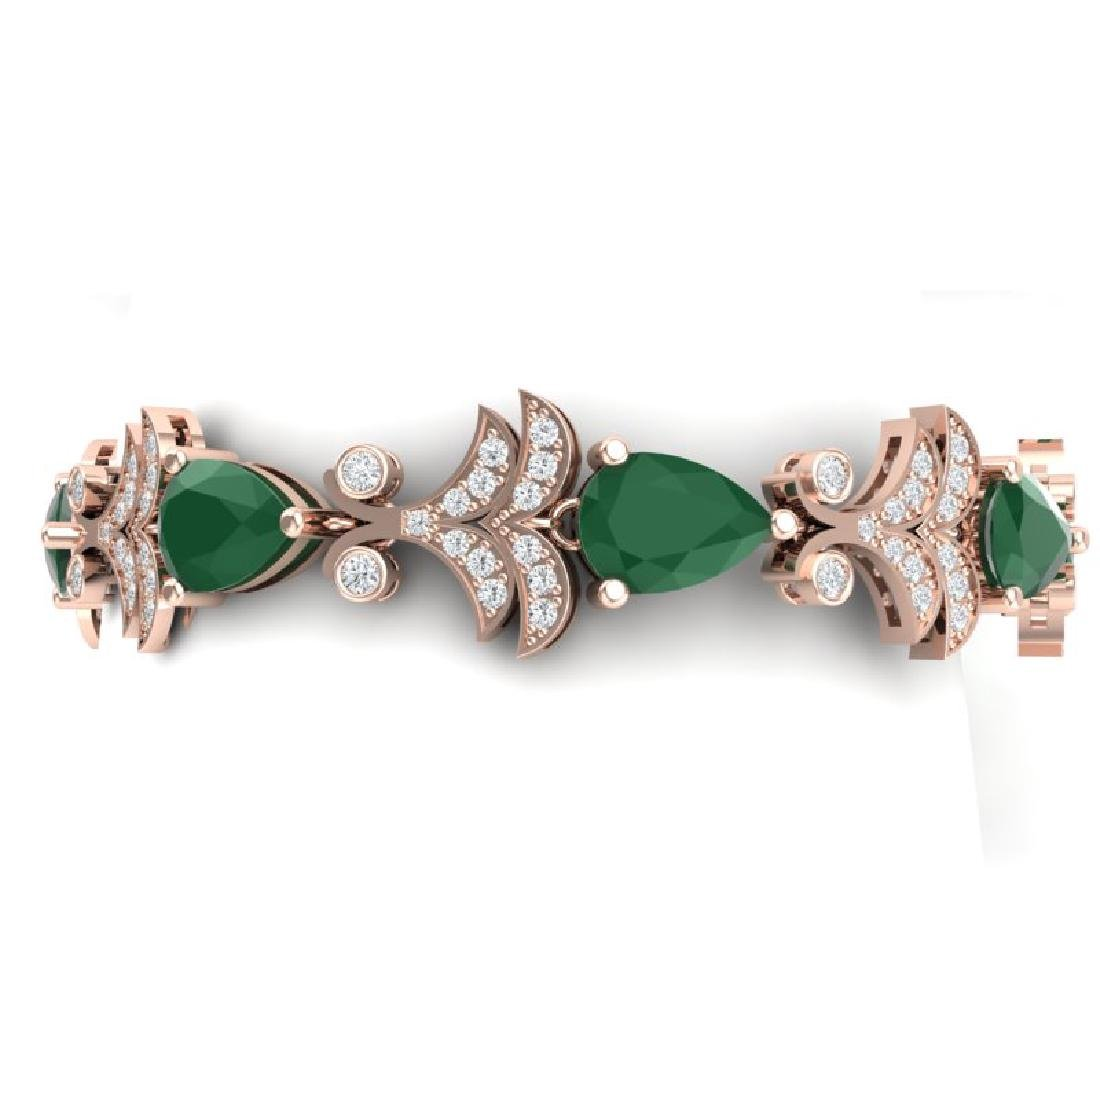 24.8 CTW Royalty Emerald & VS Diamond Bracelet 18K Rose